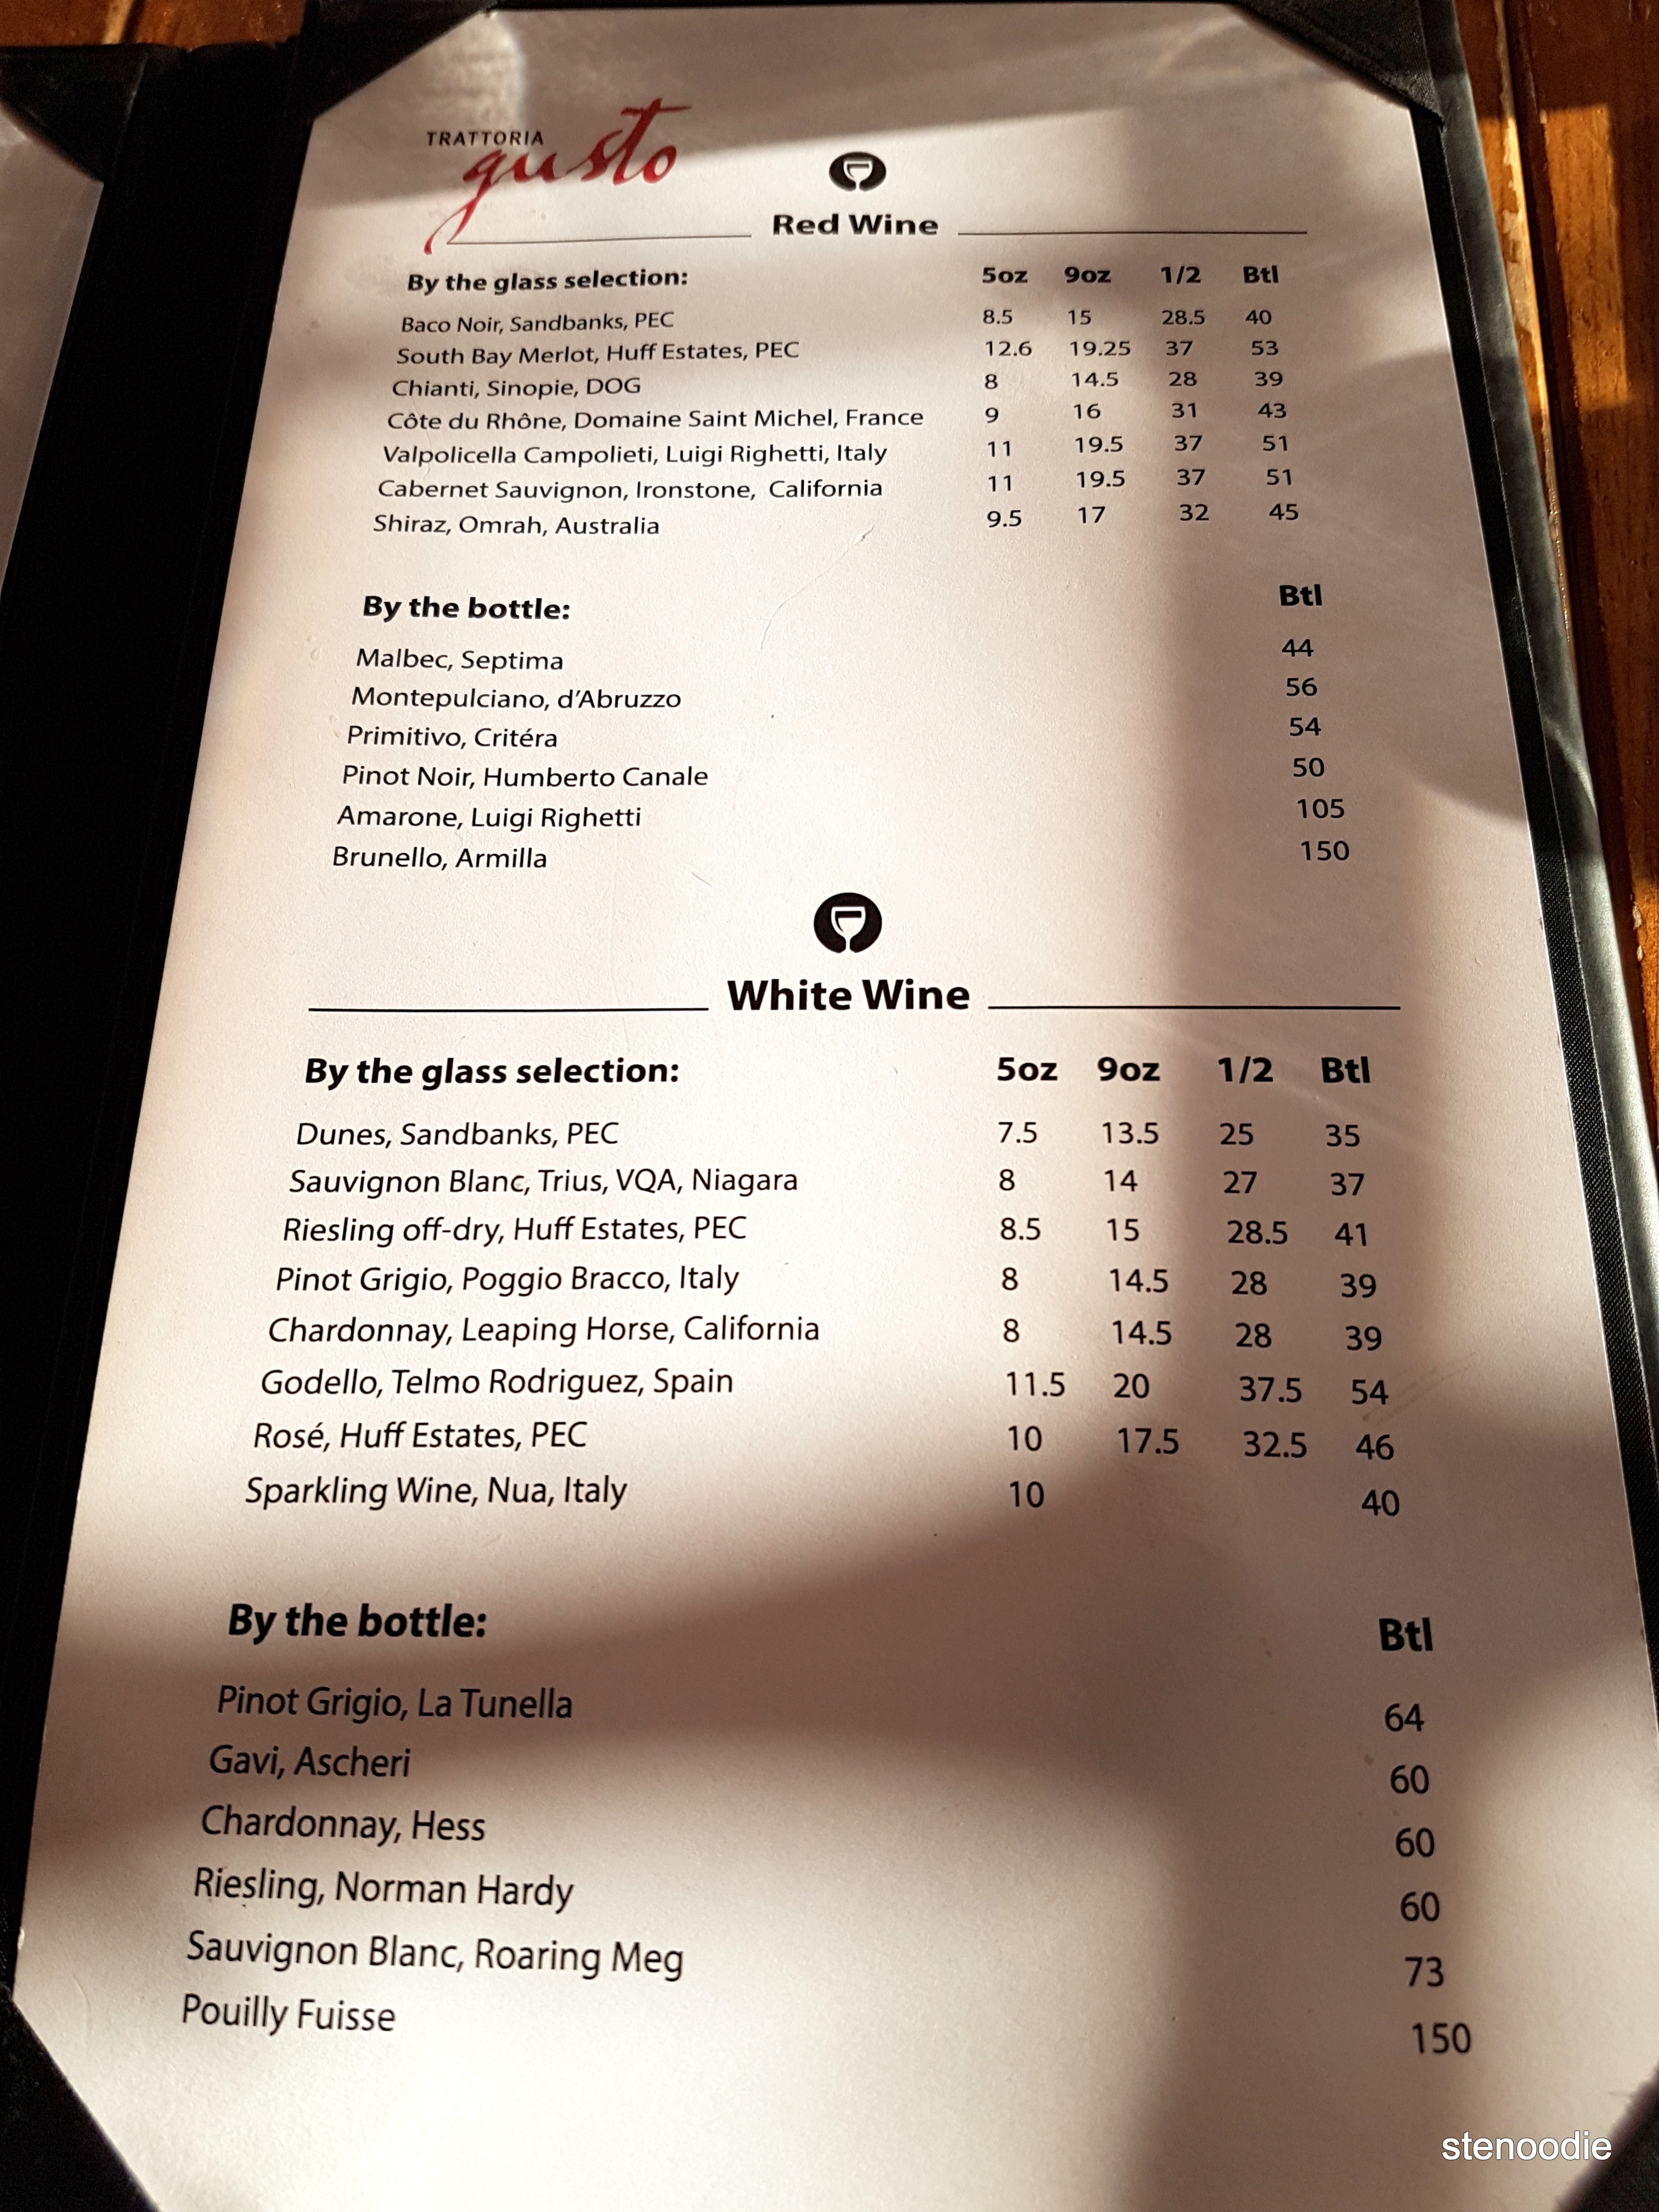 Trattoria Gusto wine menu